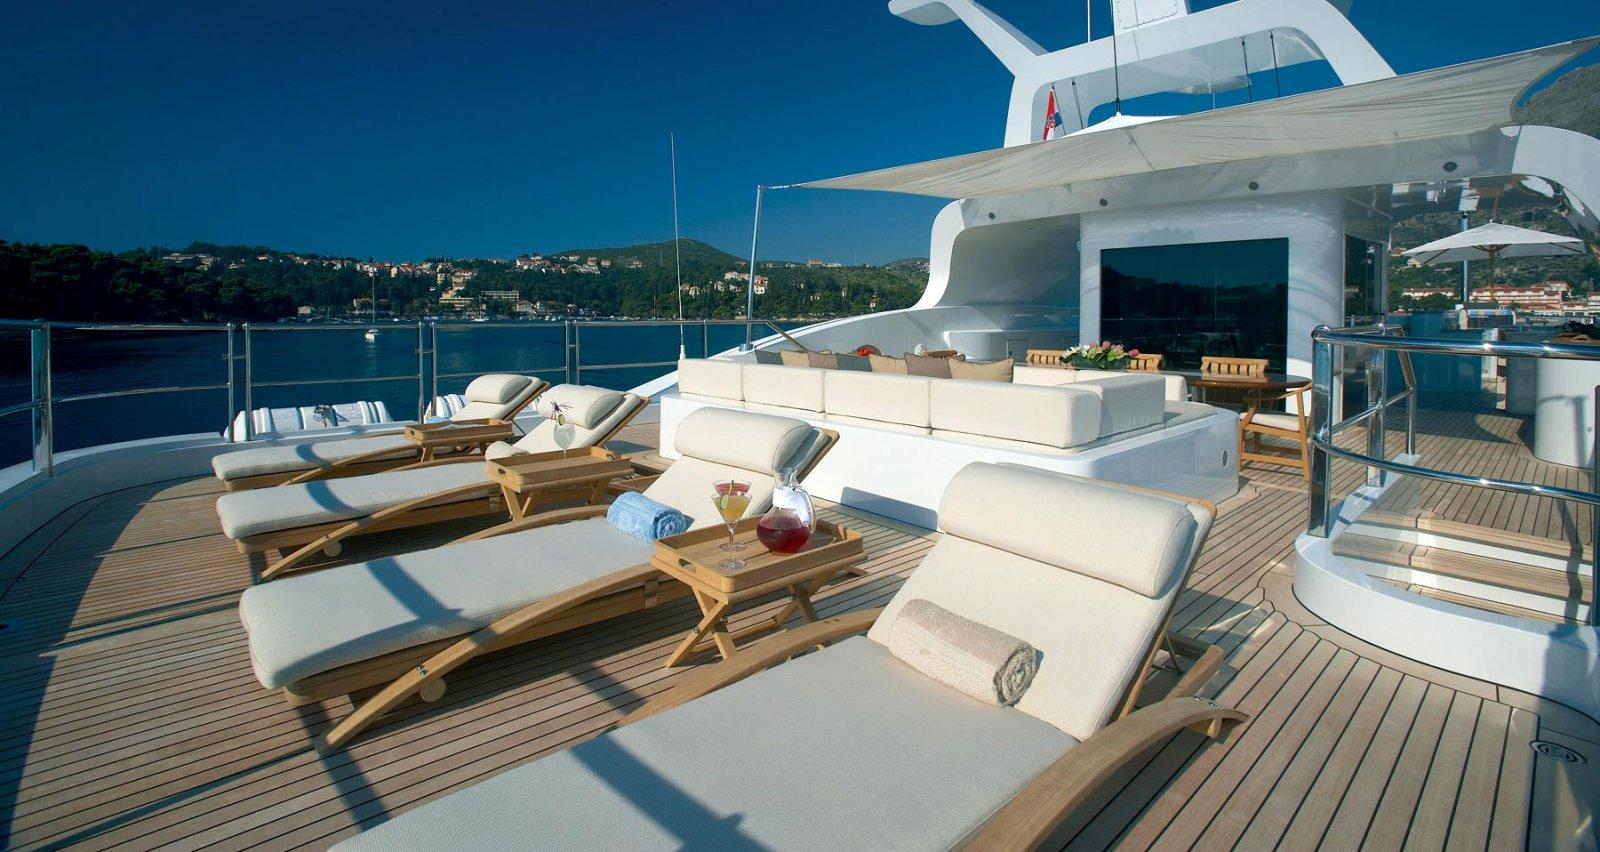 Bla Cruise i Tyrkia